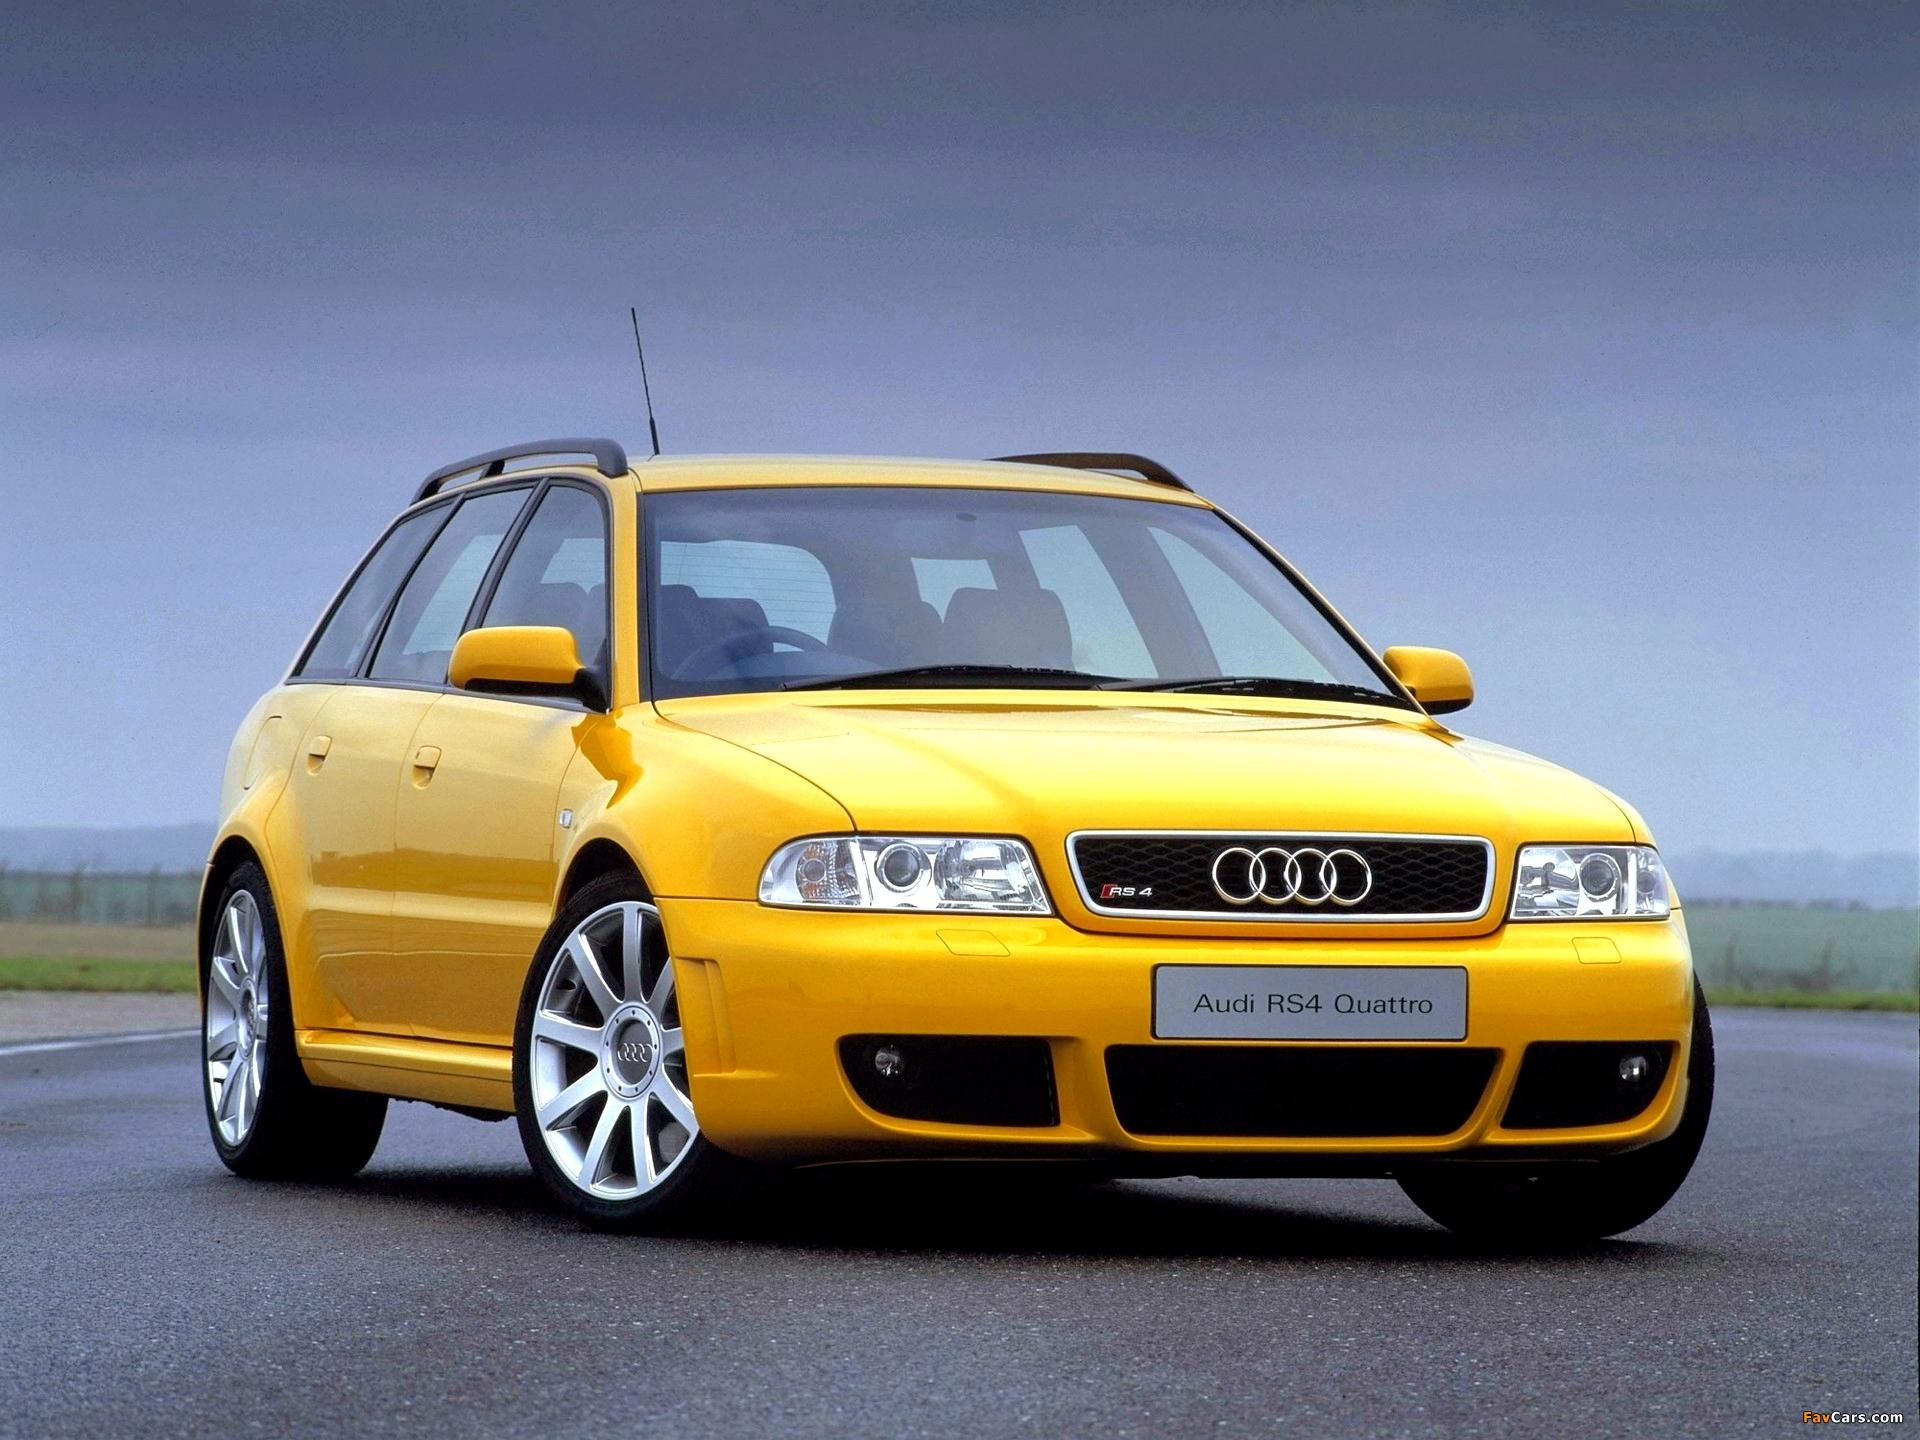 Audi Rs4 Avant Uk Spec B5 8d 2000 01 Wallpapers 1920x1440